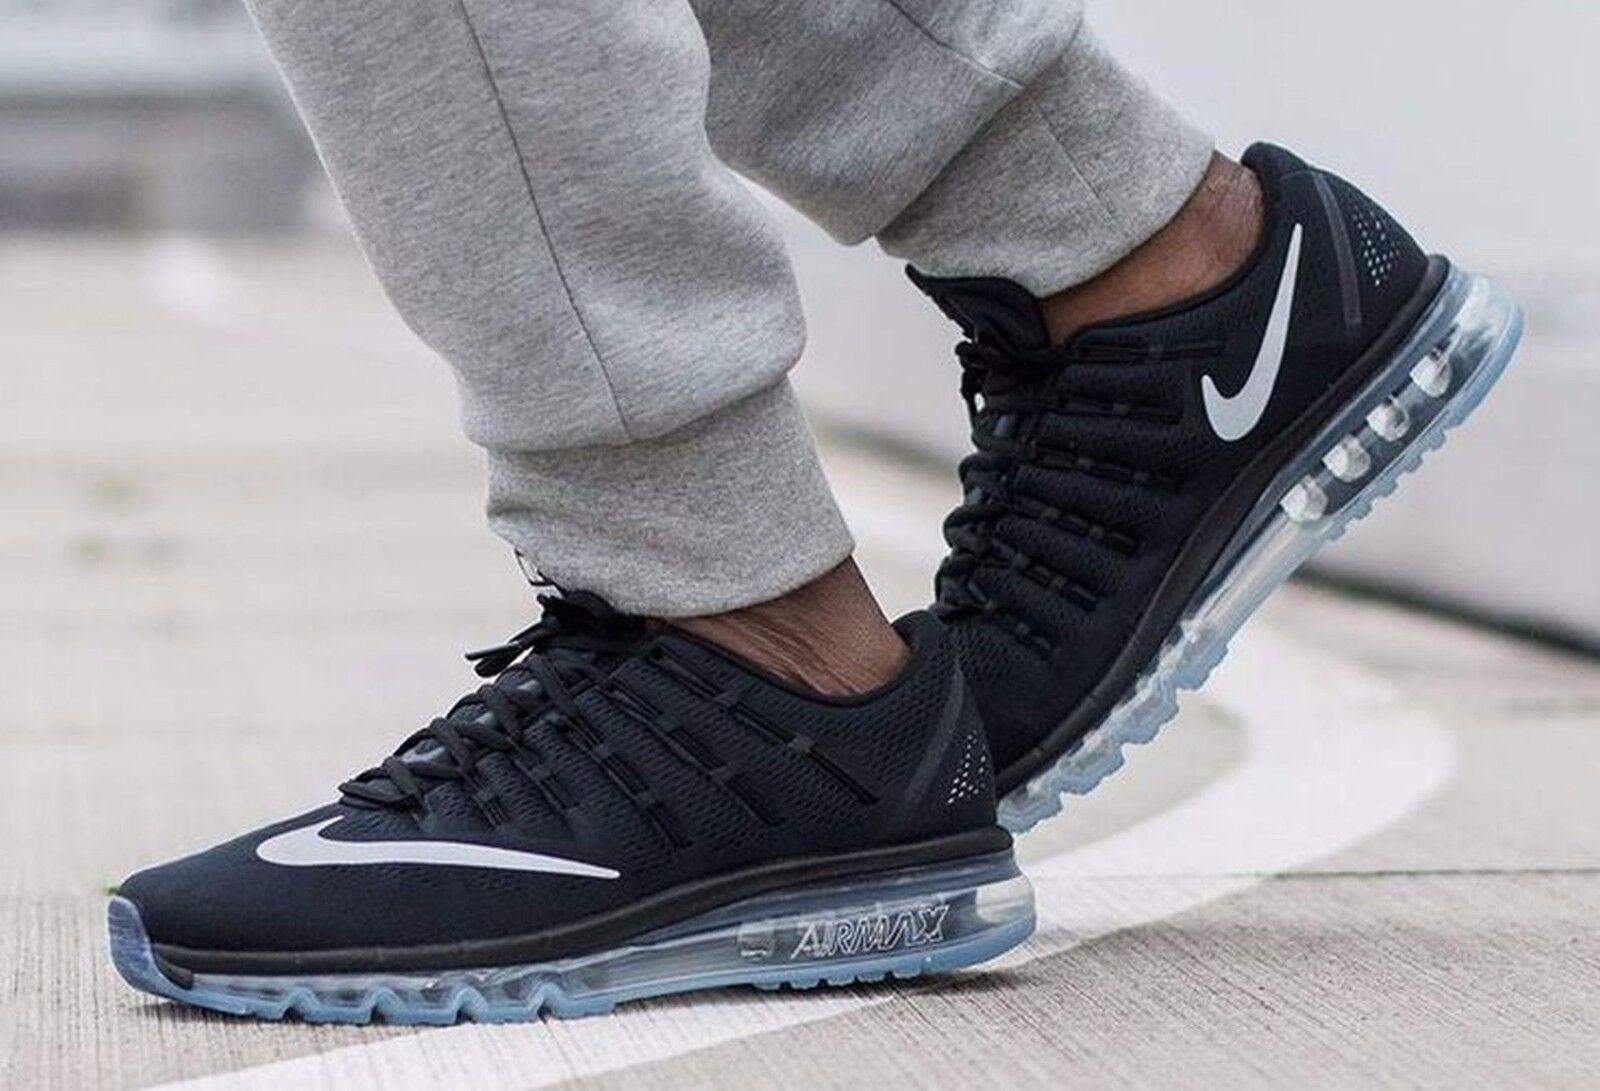 Nike Air Max 2016 Mens Sz 7.5 806771-001 Black/ White/Dark Grey